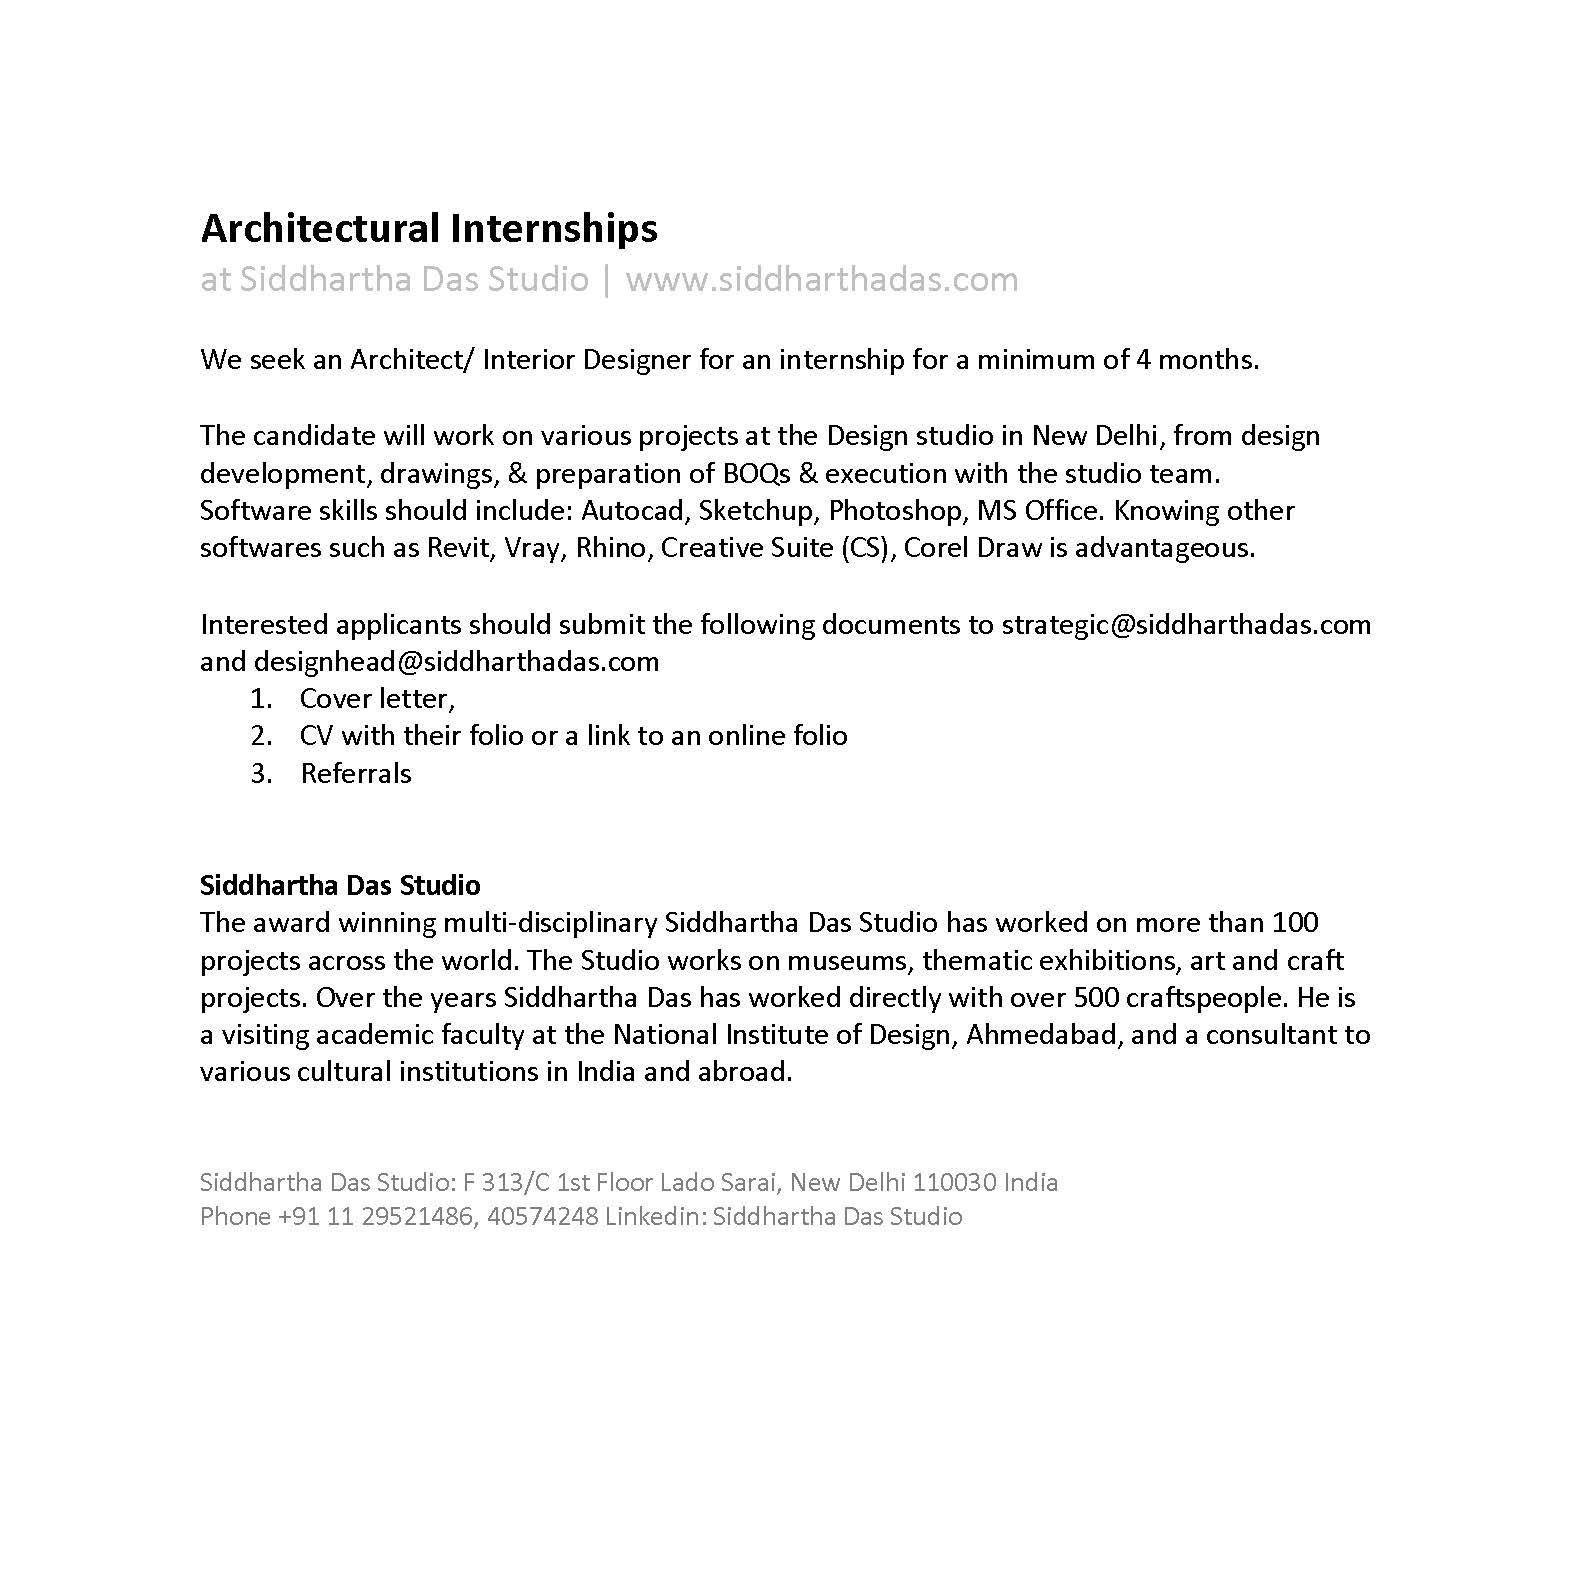 Design Internship Siddhartha Das Studio